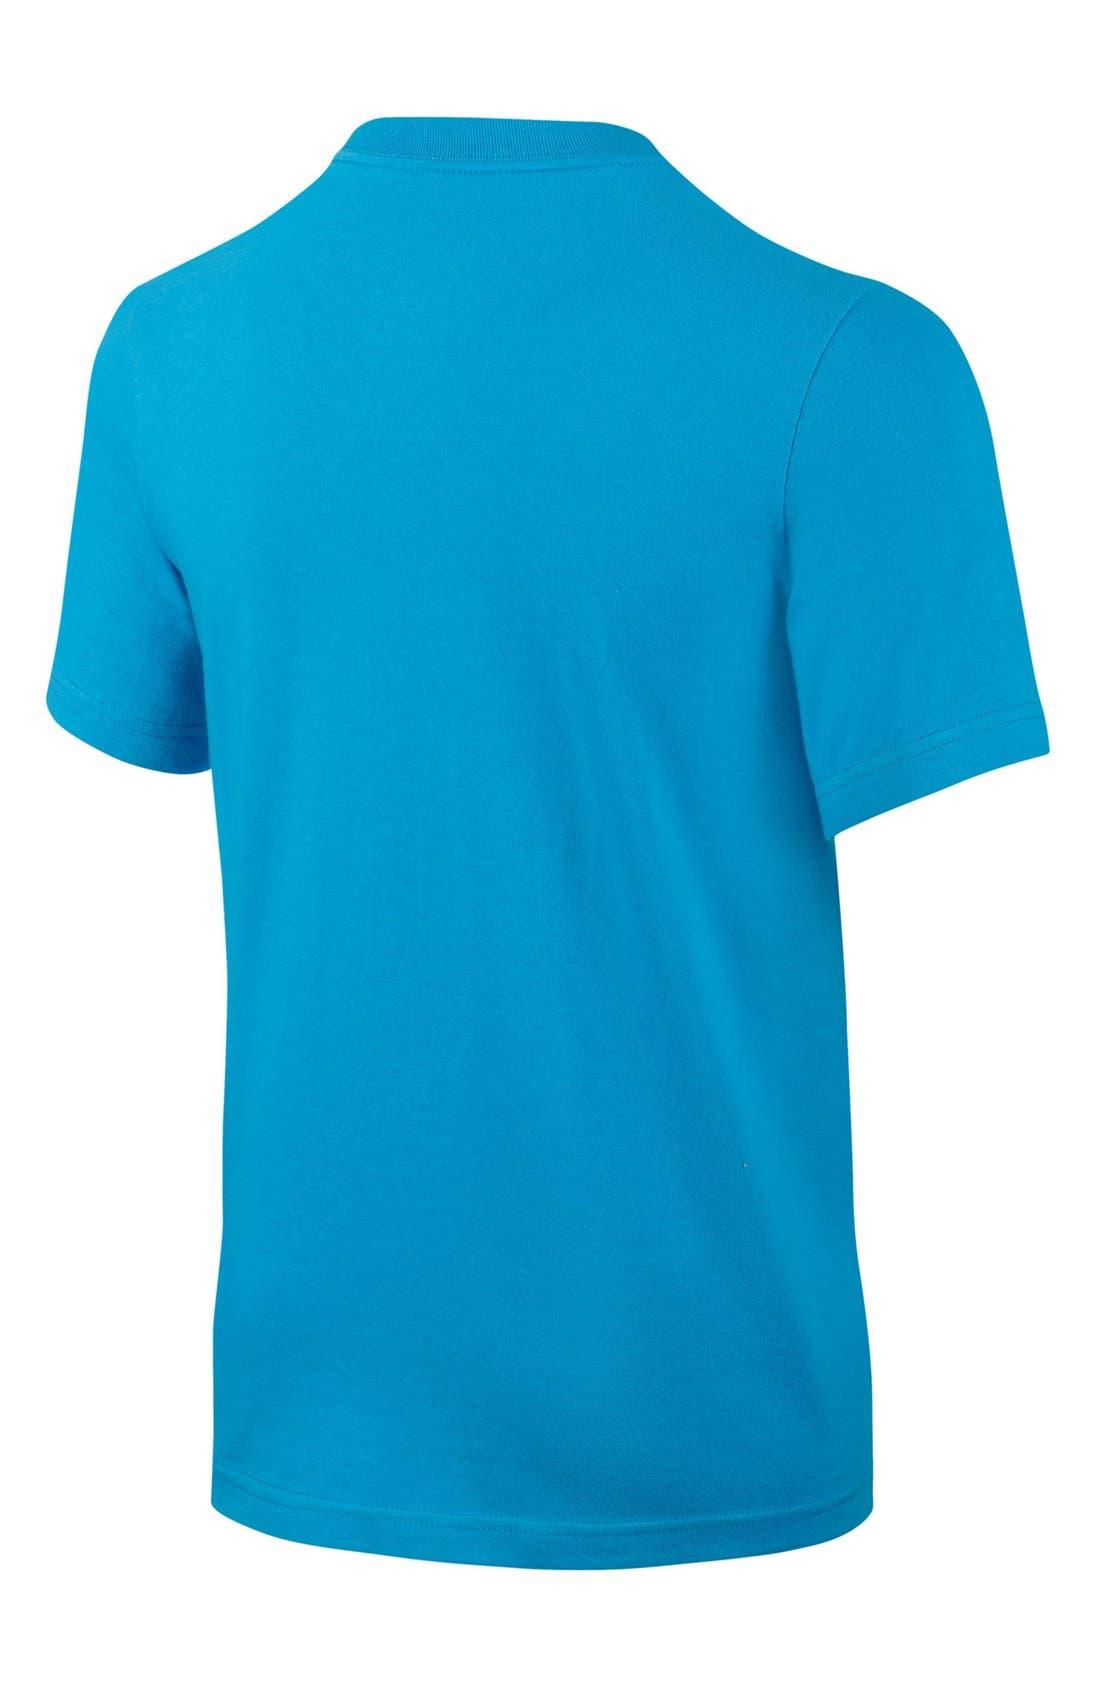 Alternate Image 2  - Nike 'Nobody Trains TD' Short Sleeve T-Shirt (Big Boys)